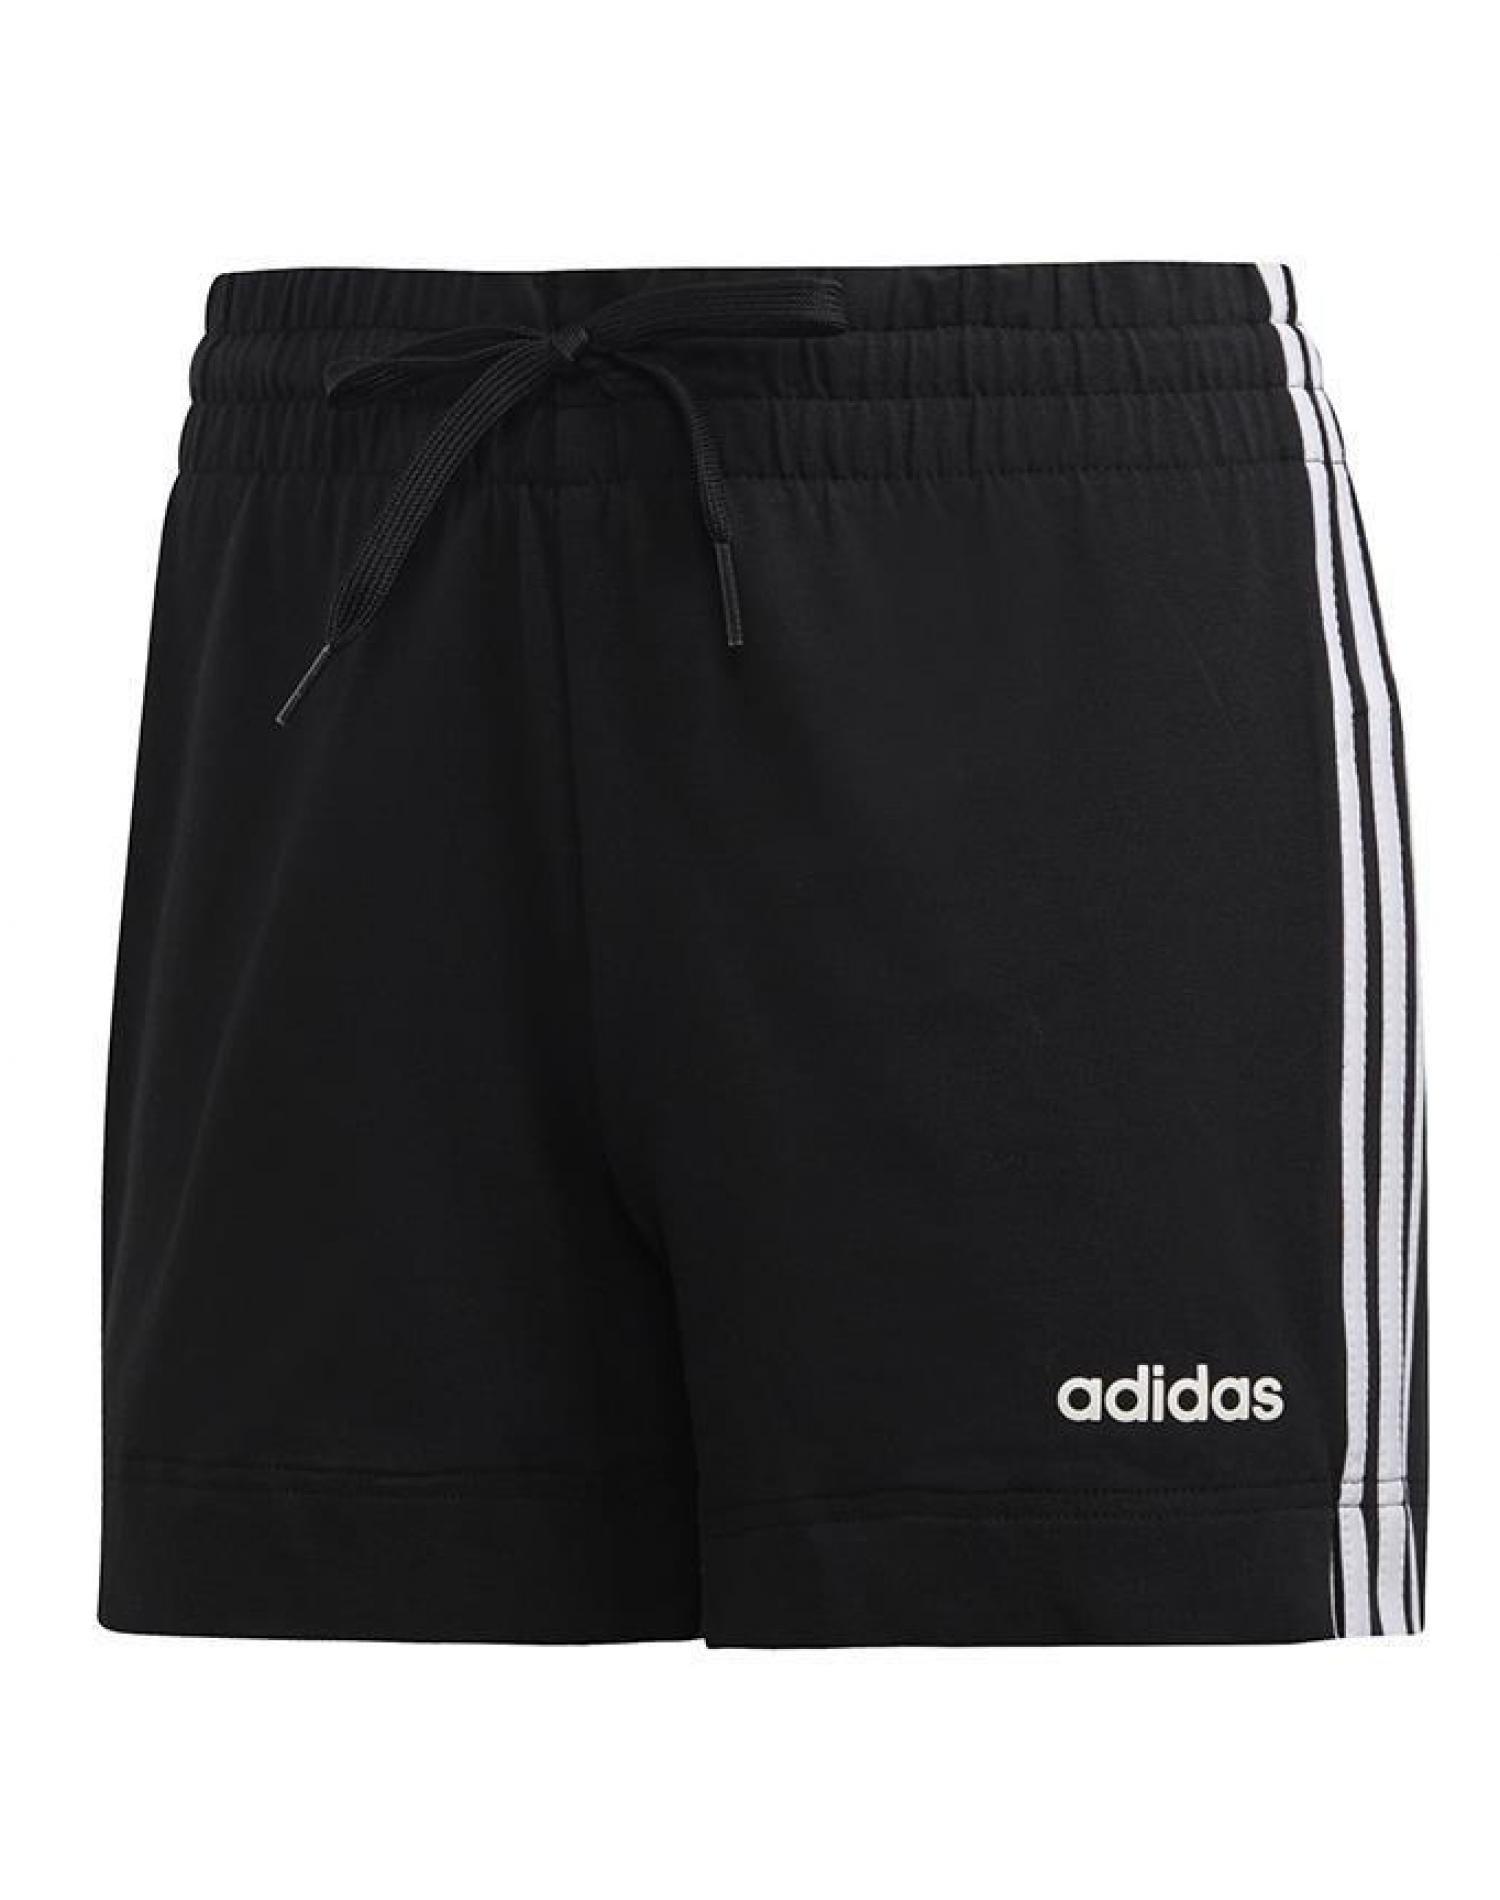 Short Negro Adidas W Essential 3 Stripes